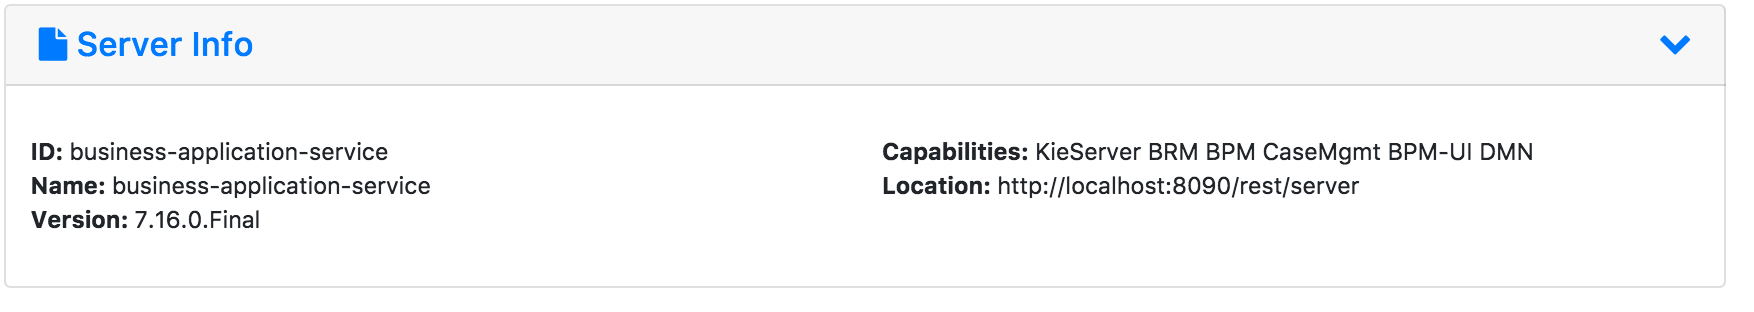 Server info